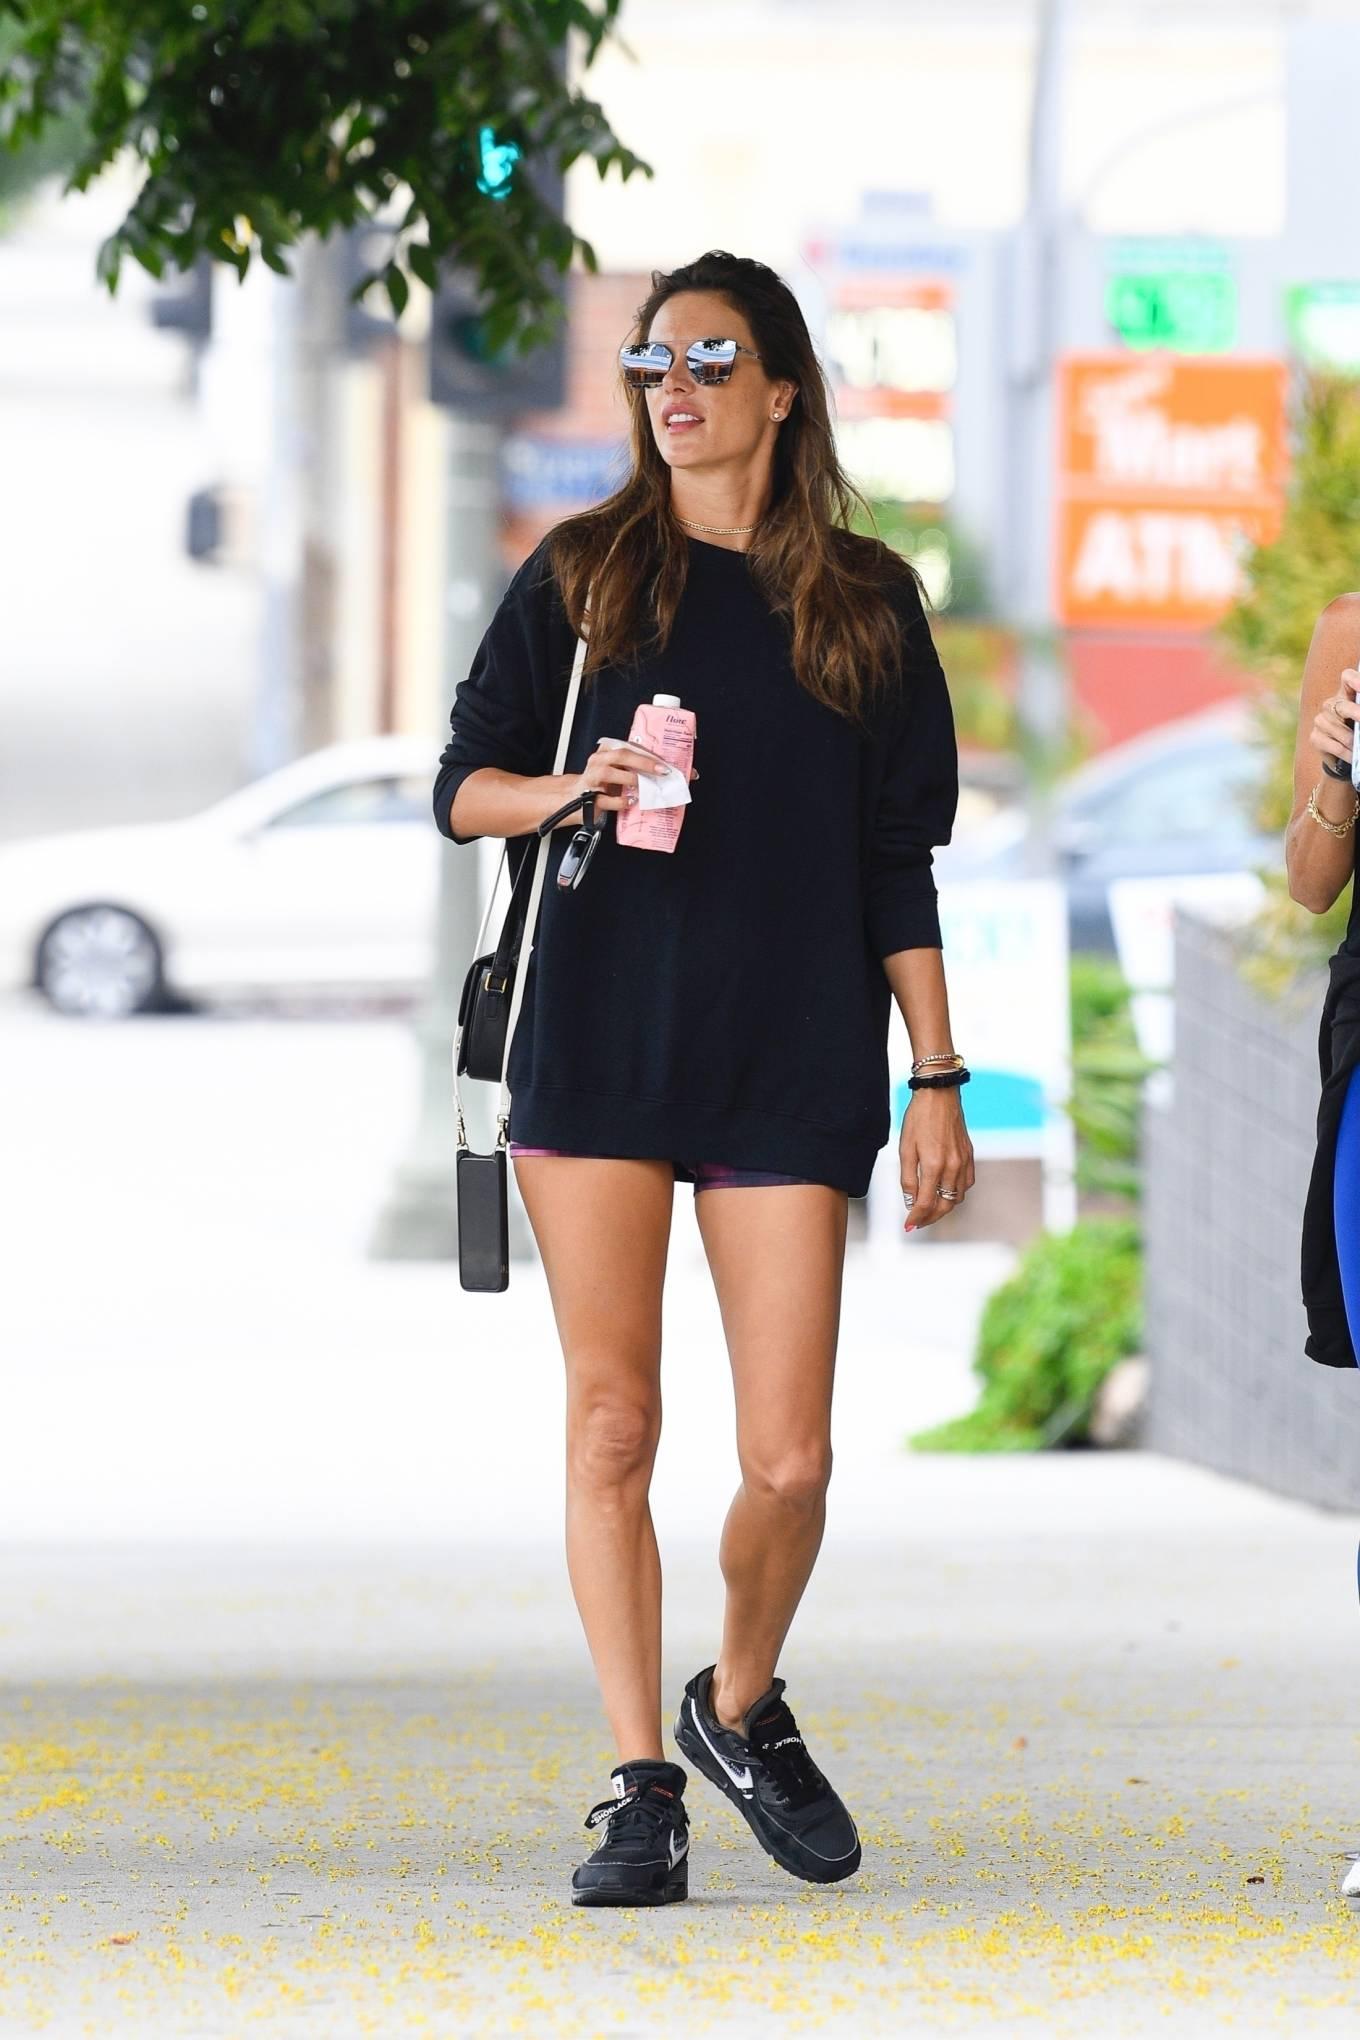 Alessandra Ambrosio rocking brand logo black Nike lace-up sneakers